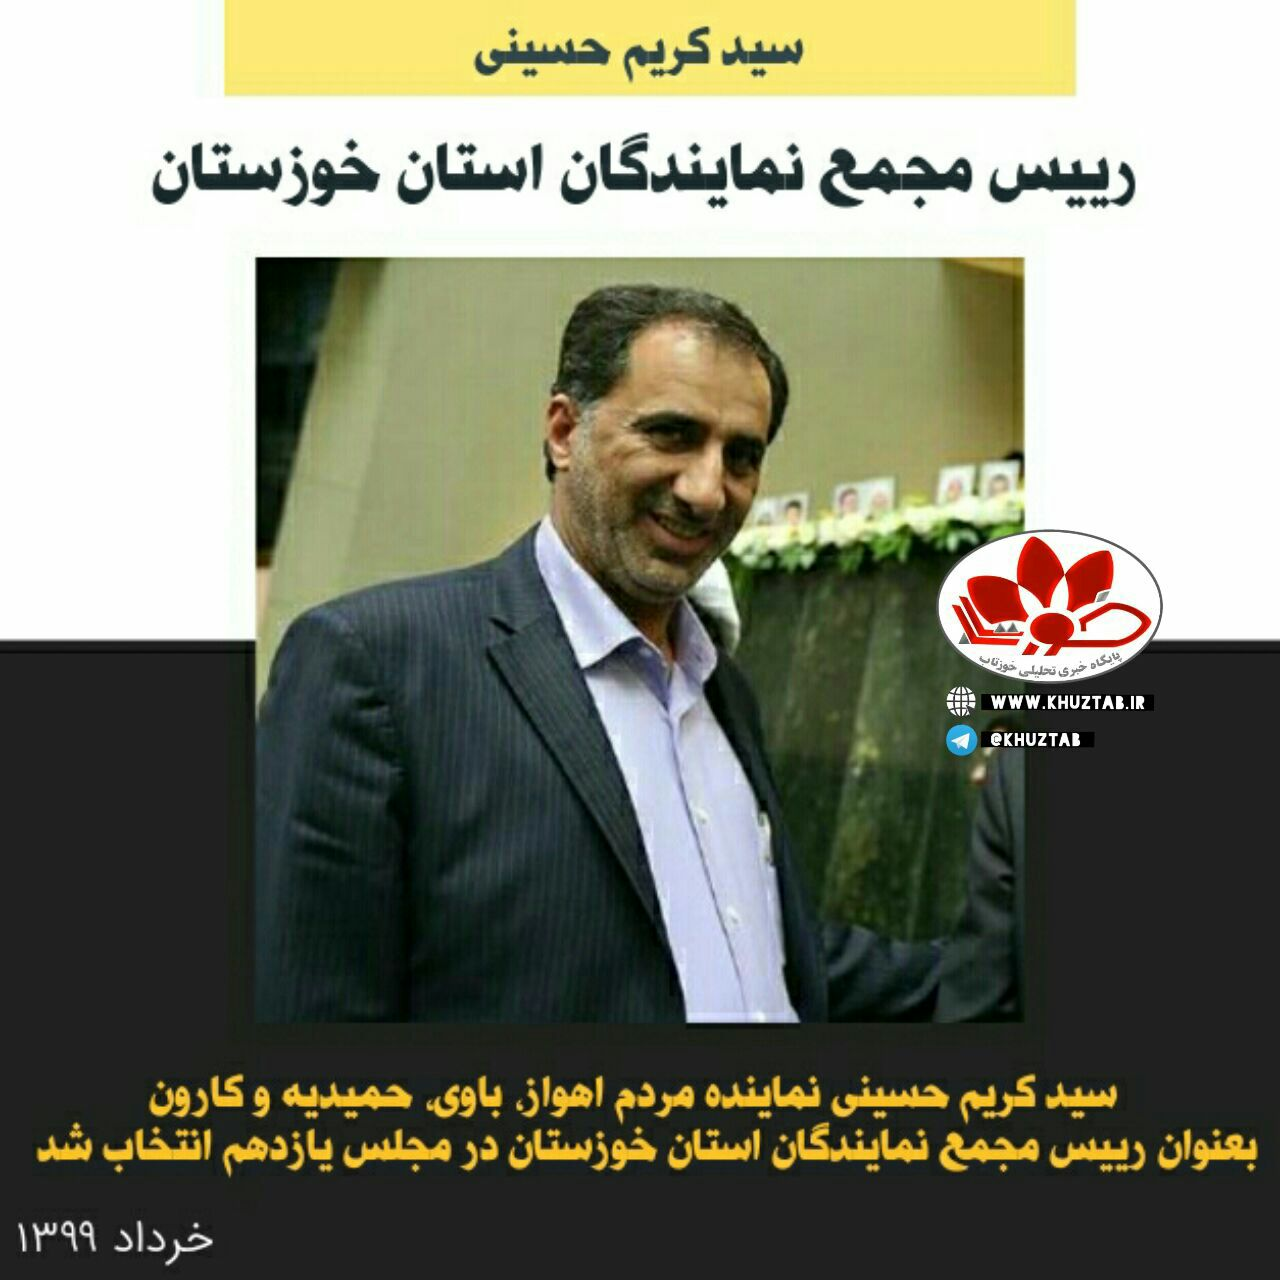 IMG 20200601 061120 793 رییس مجمع نمایندگان استان خوزستان در مجلس یازدهم انتخاب شد